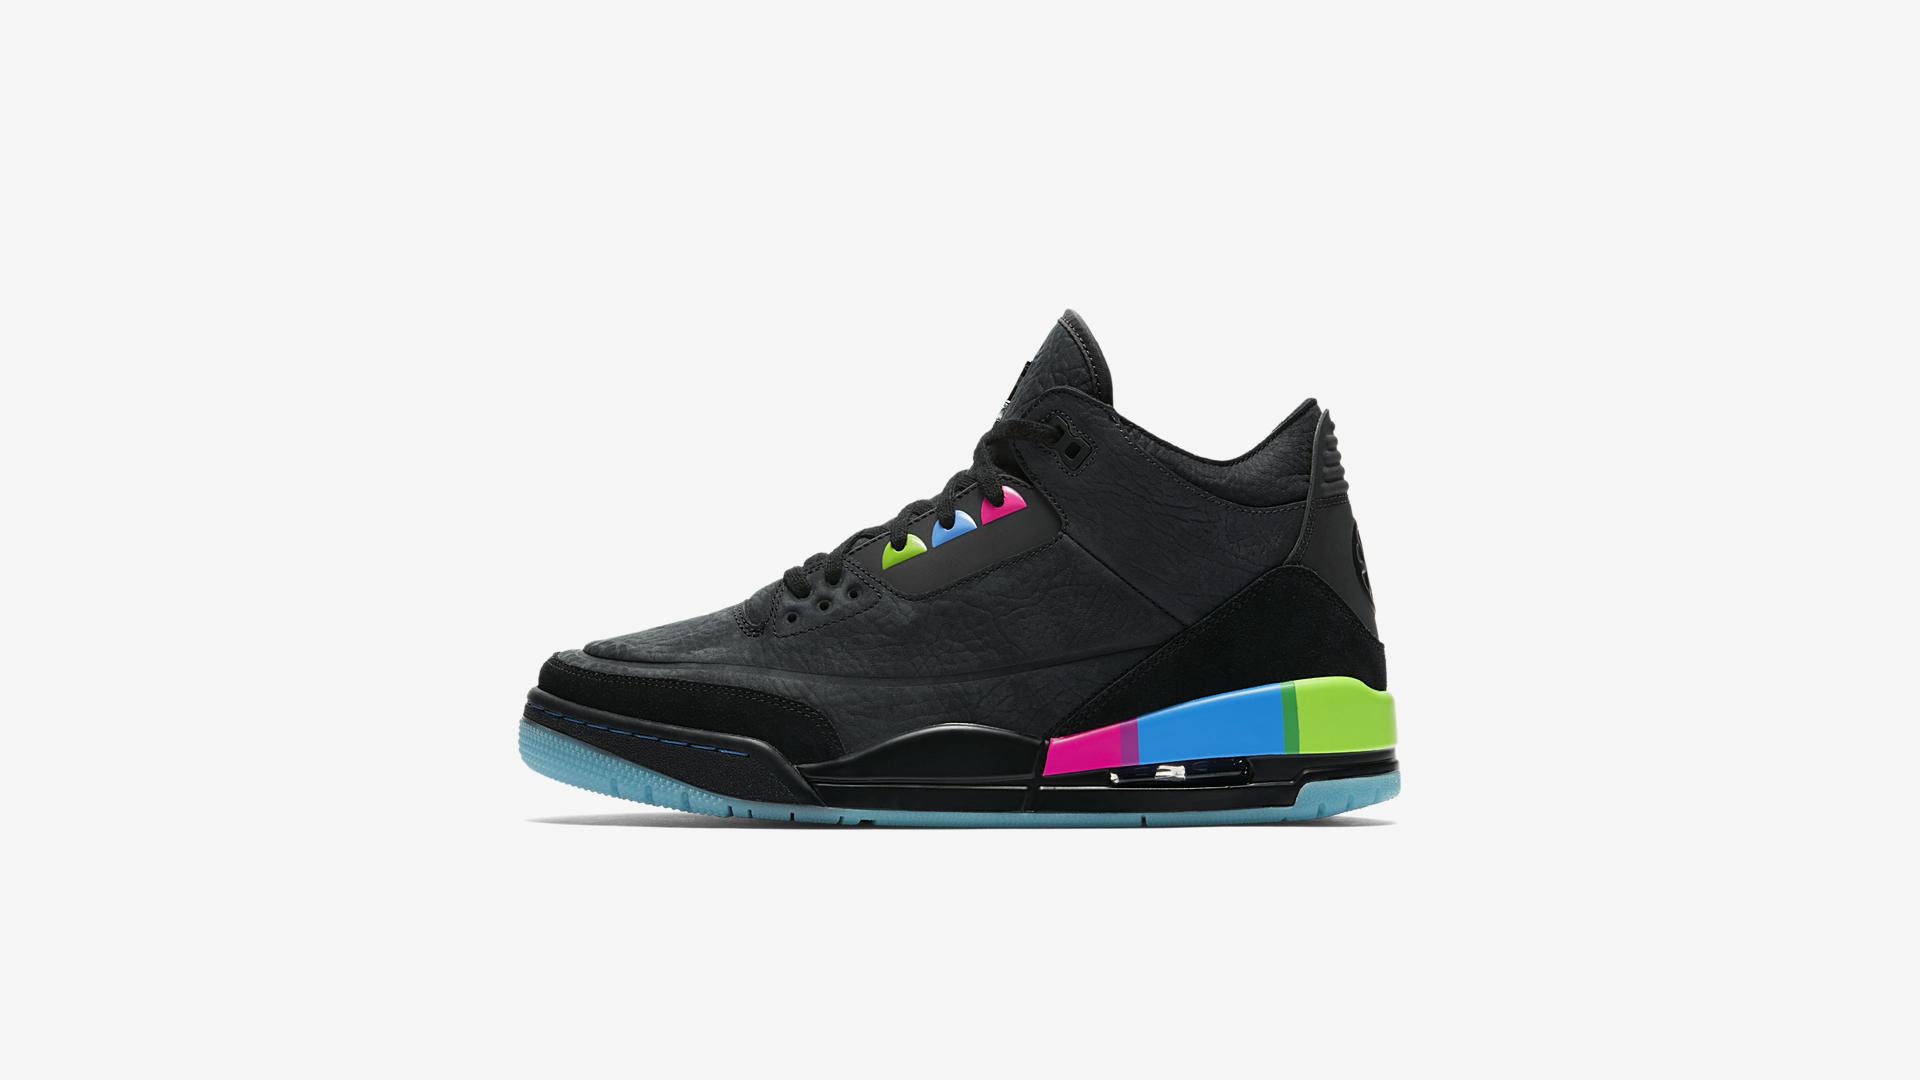 Air Jordan Retro 3 SE Q54 Black/Electric Green-Infrared 23-Black (AT9195-001)